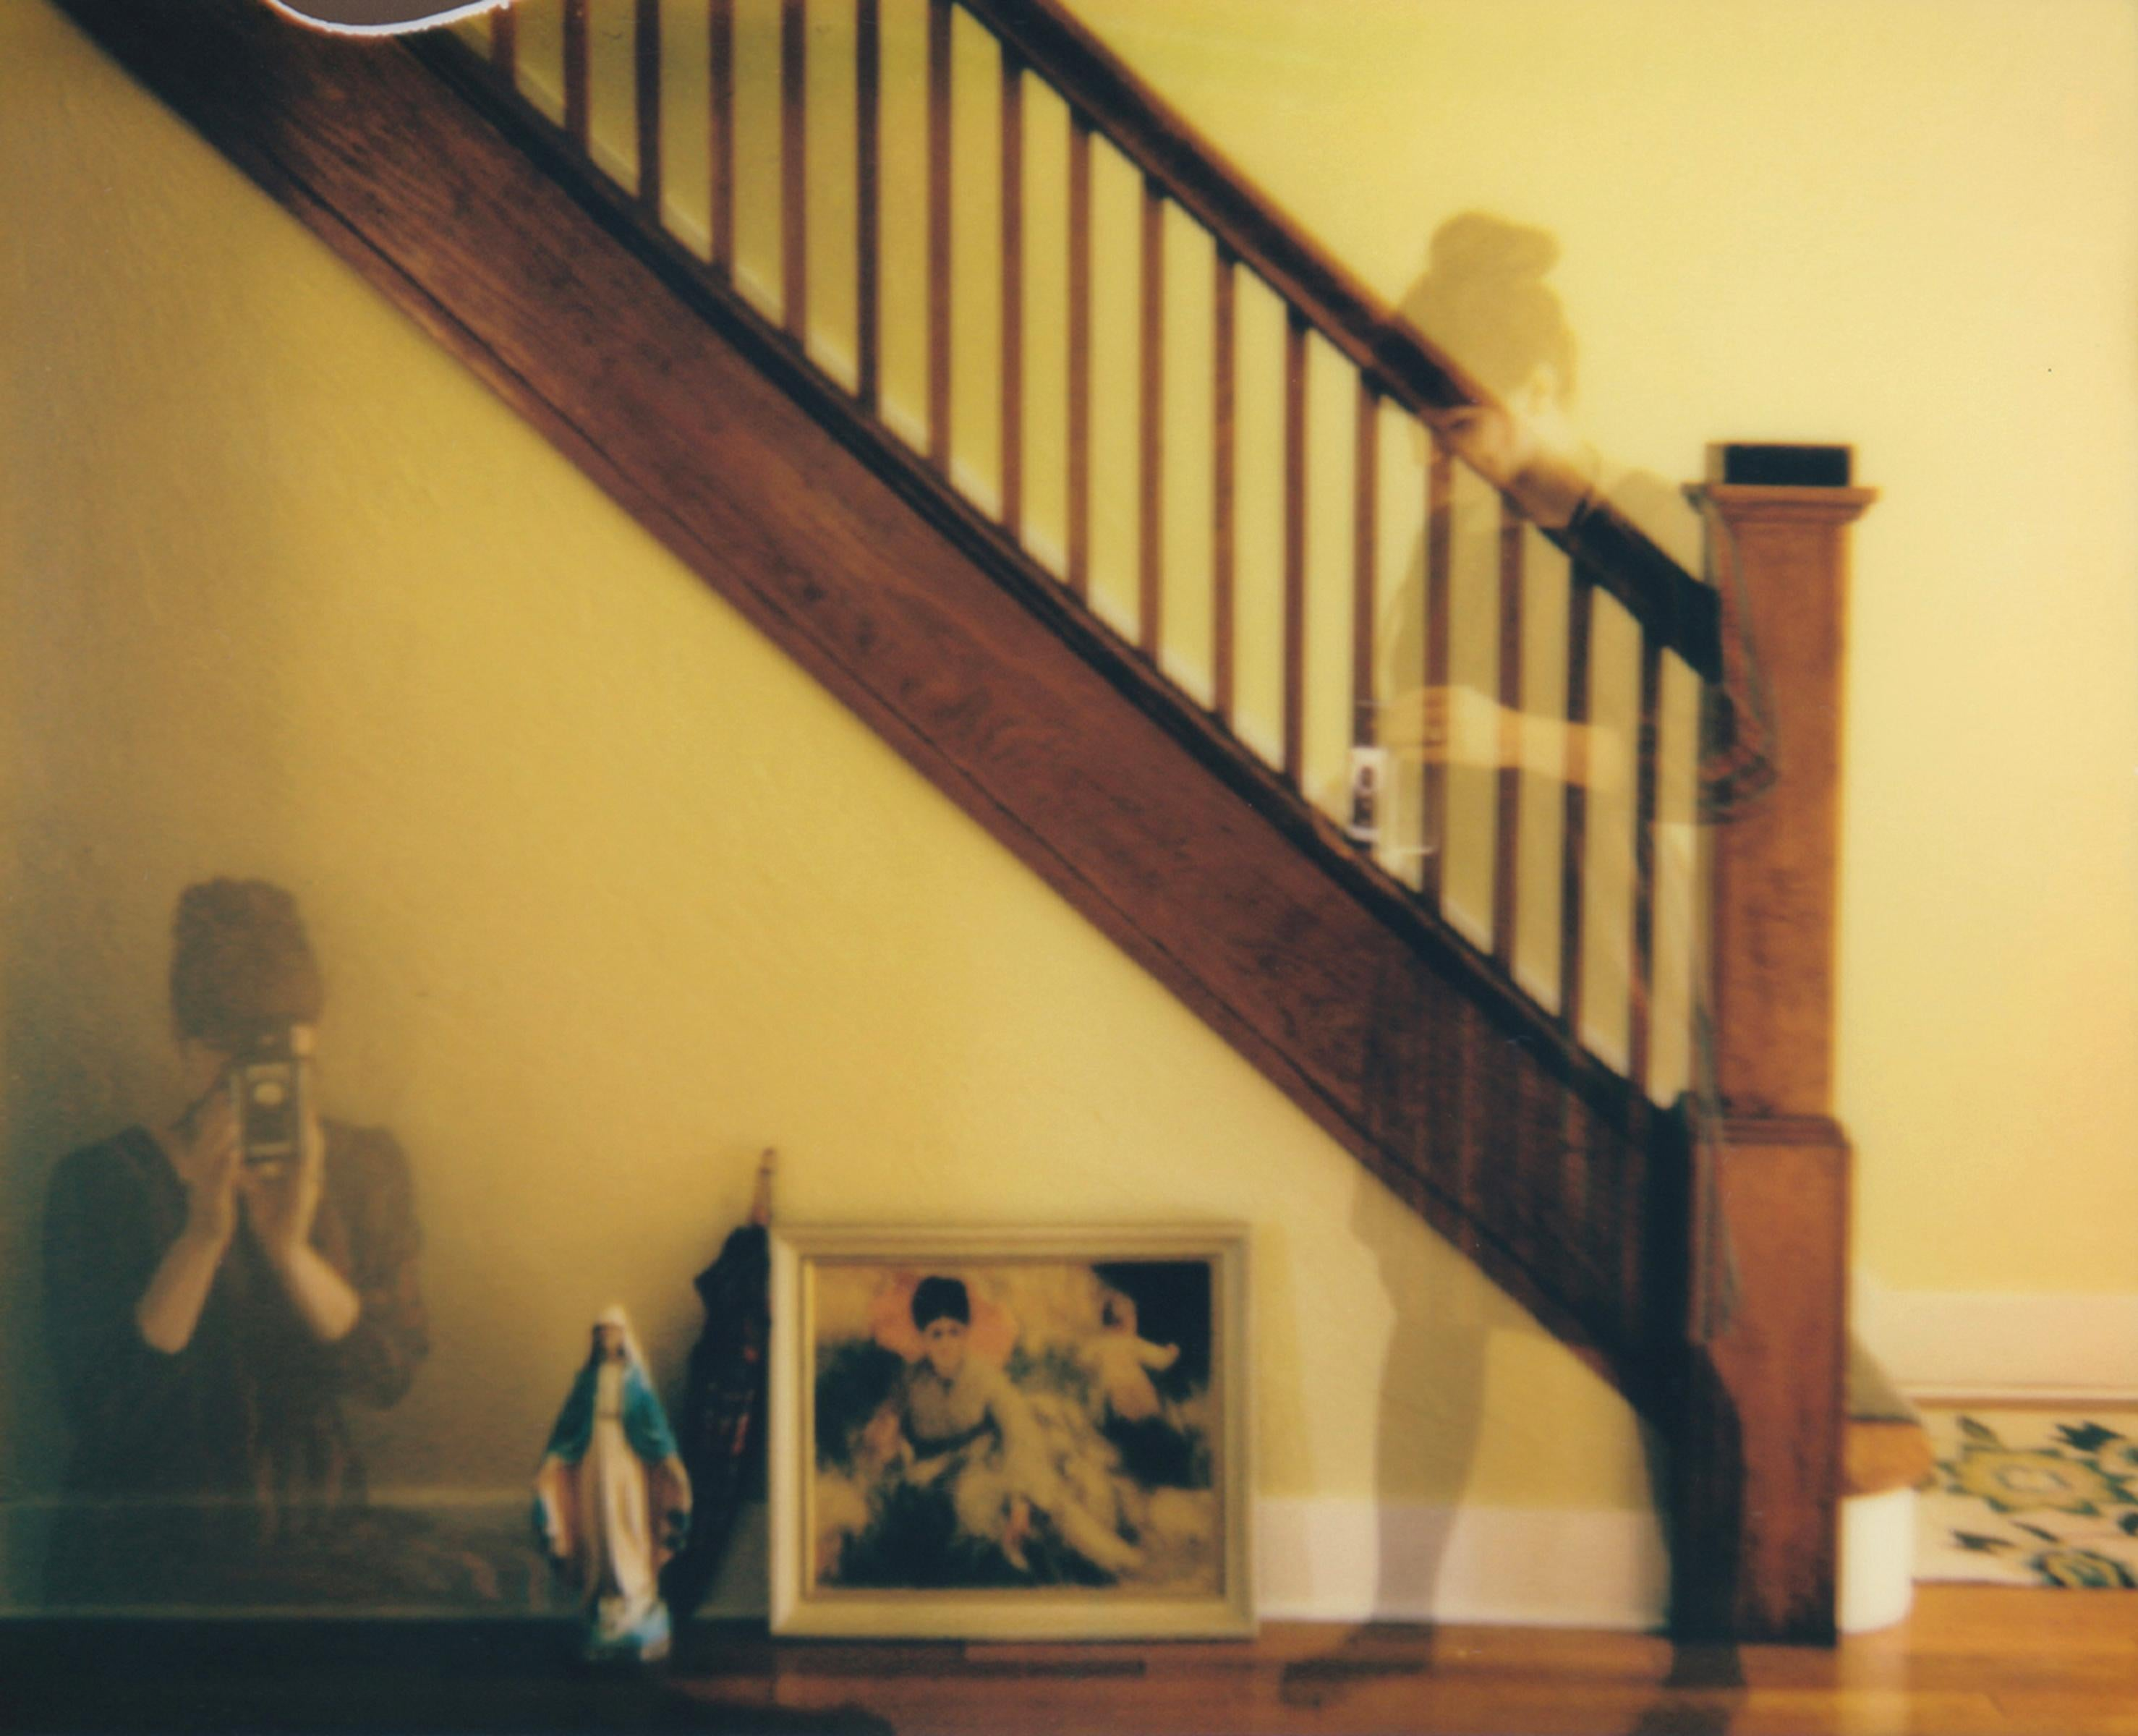 Nesting - Contemporary, Figurative, Woman, Polaroid, Photograph, 21st Century